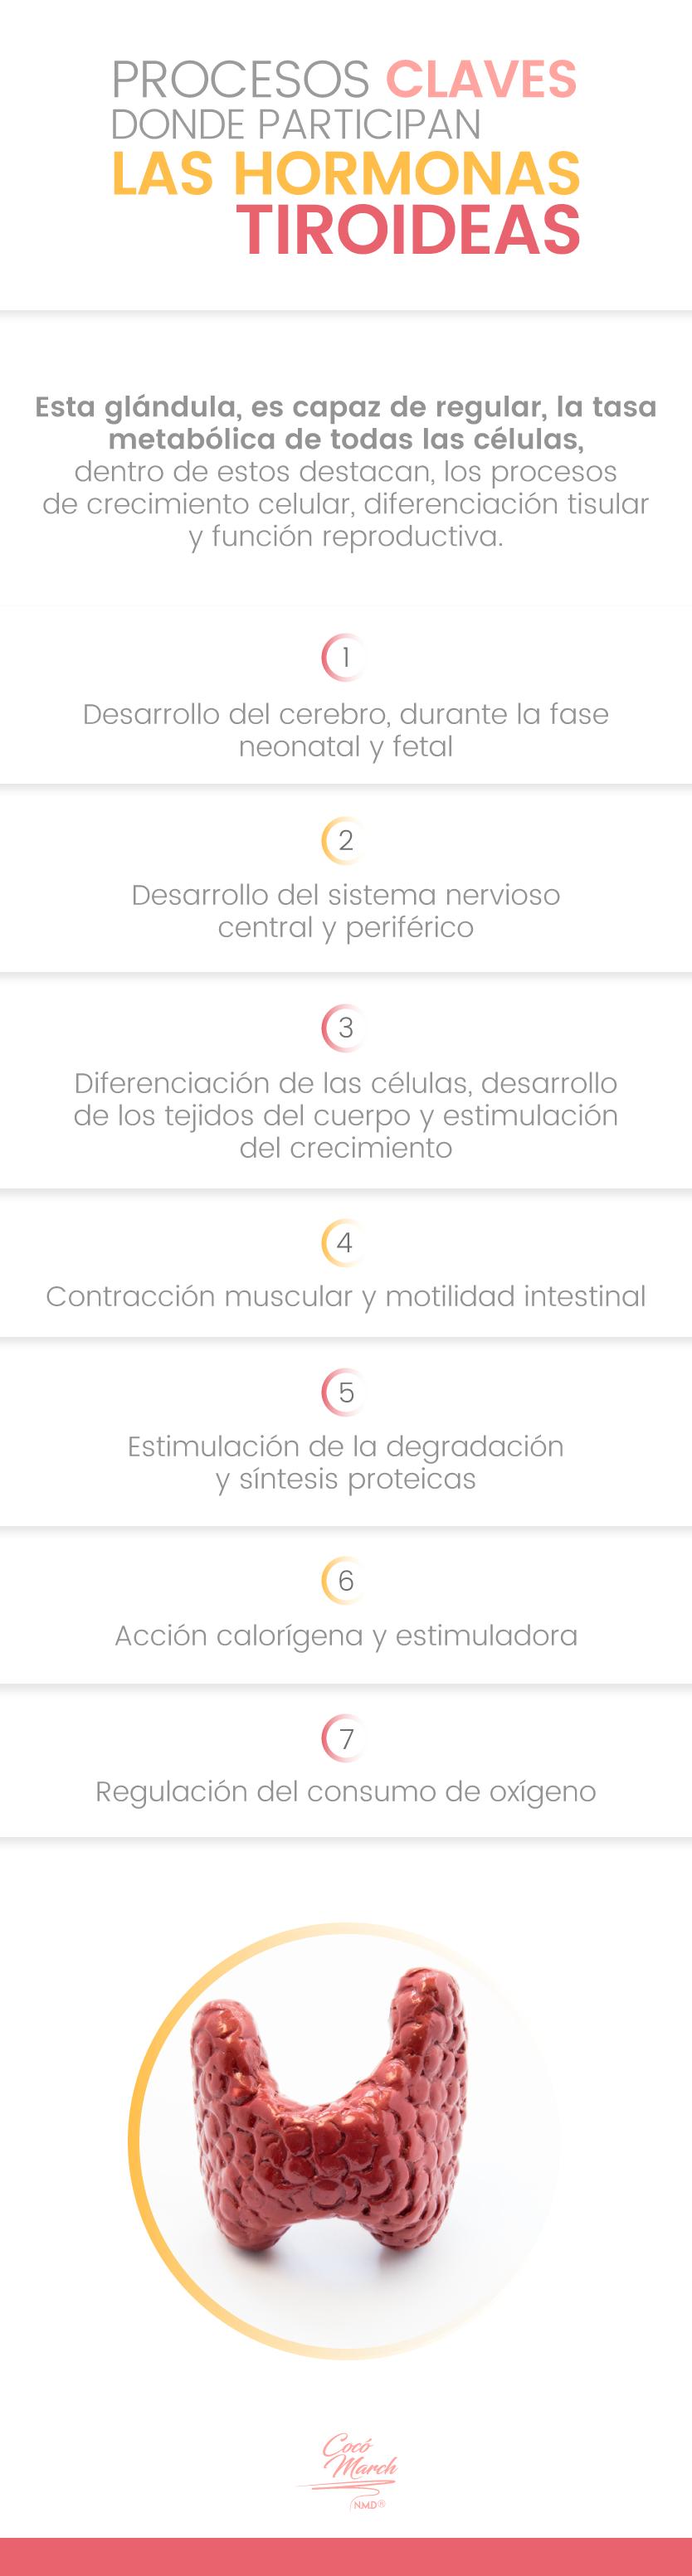 hipotiroidismo-procesos-claves